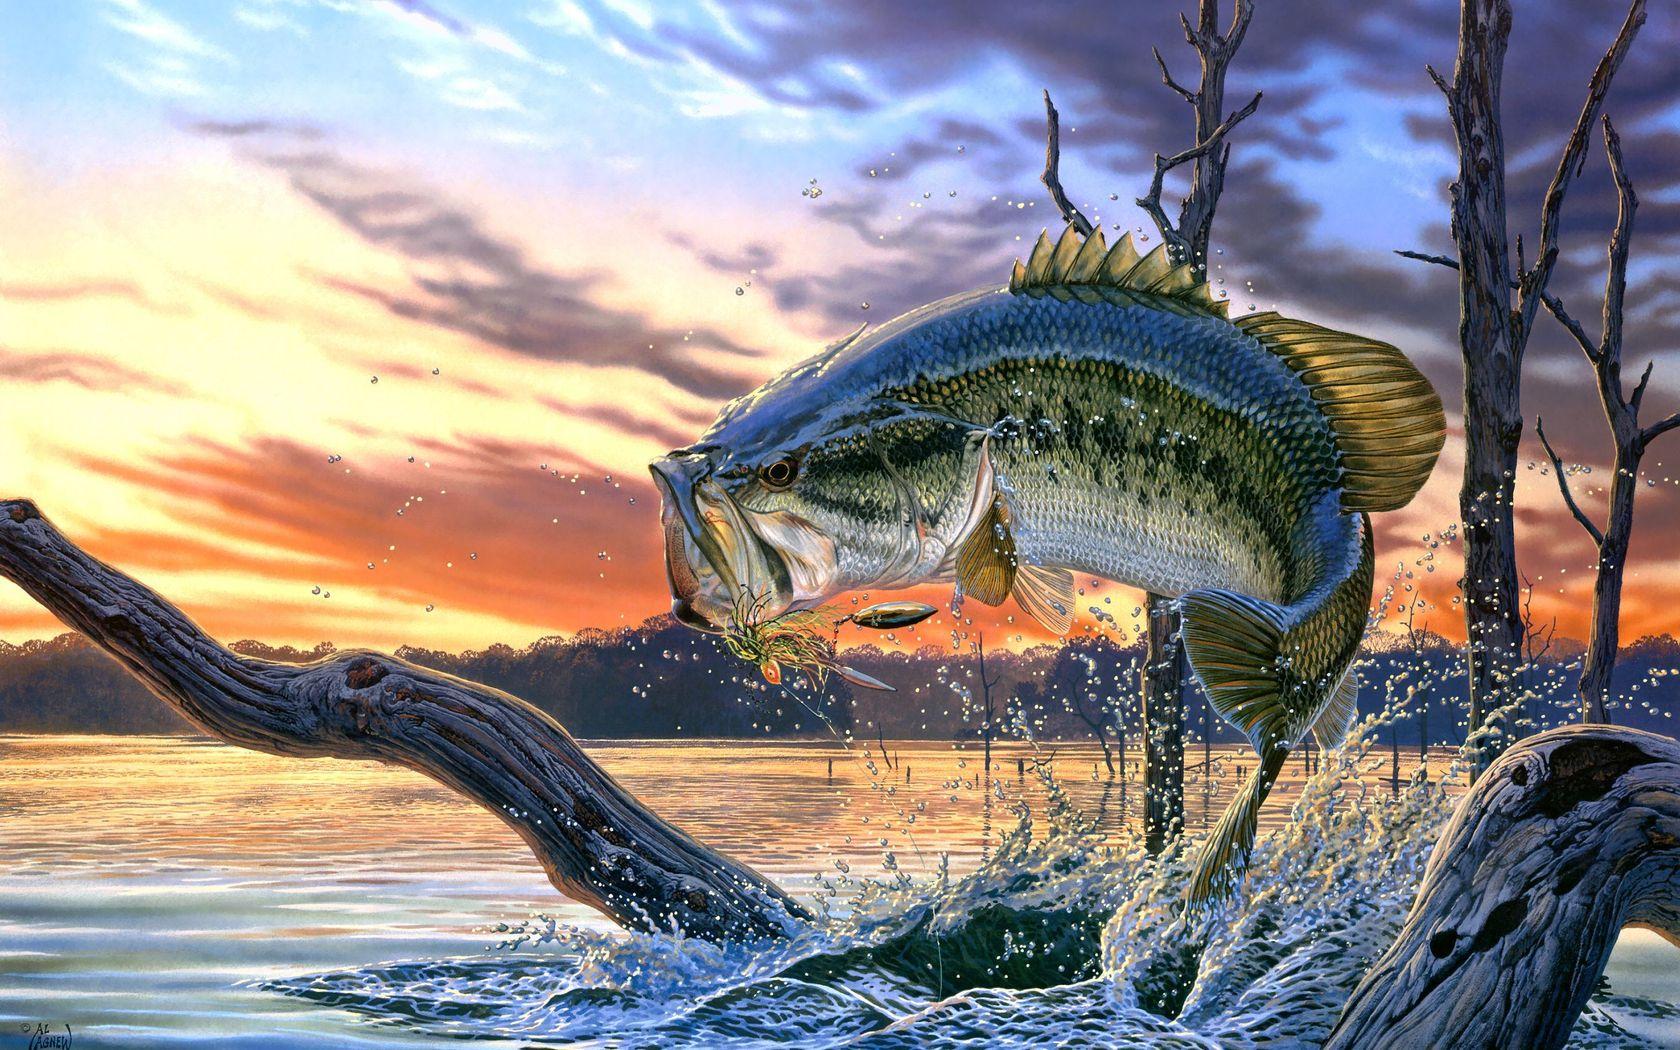 largemouth bass fishing wallpaper screensaver 1680x1050